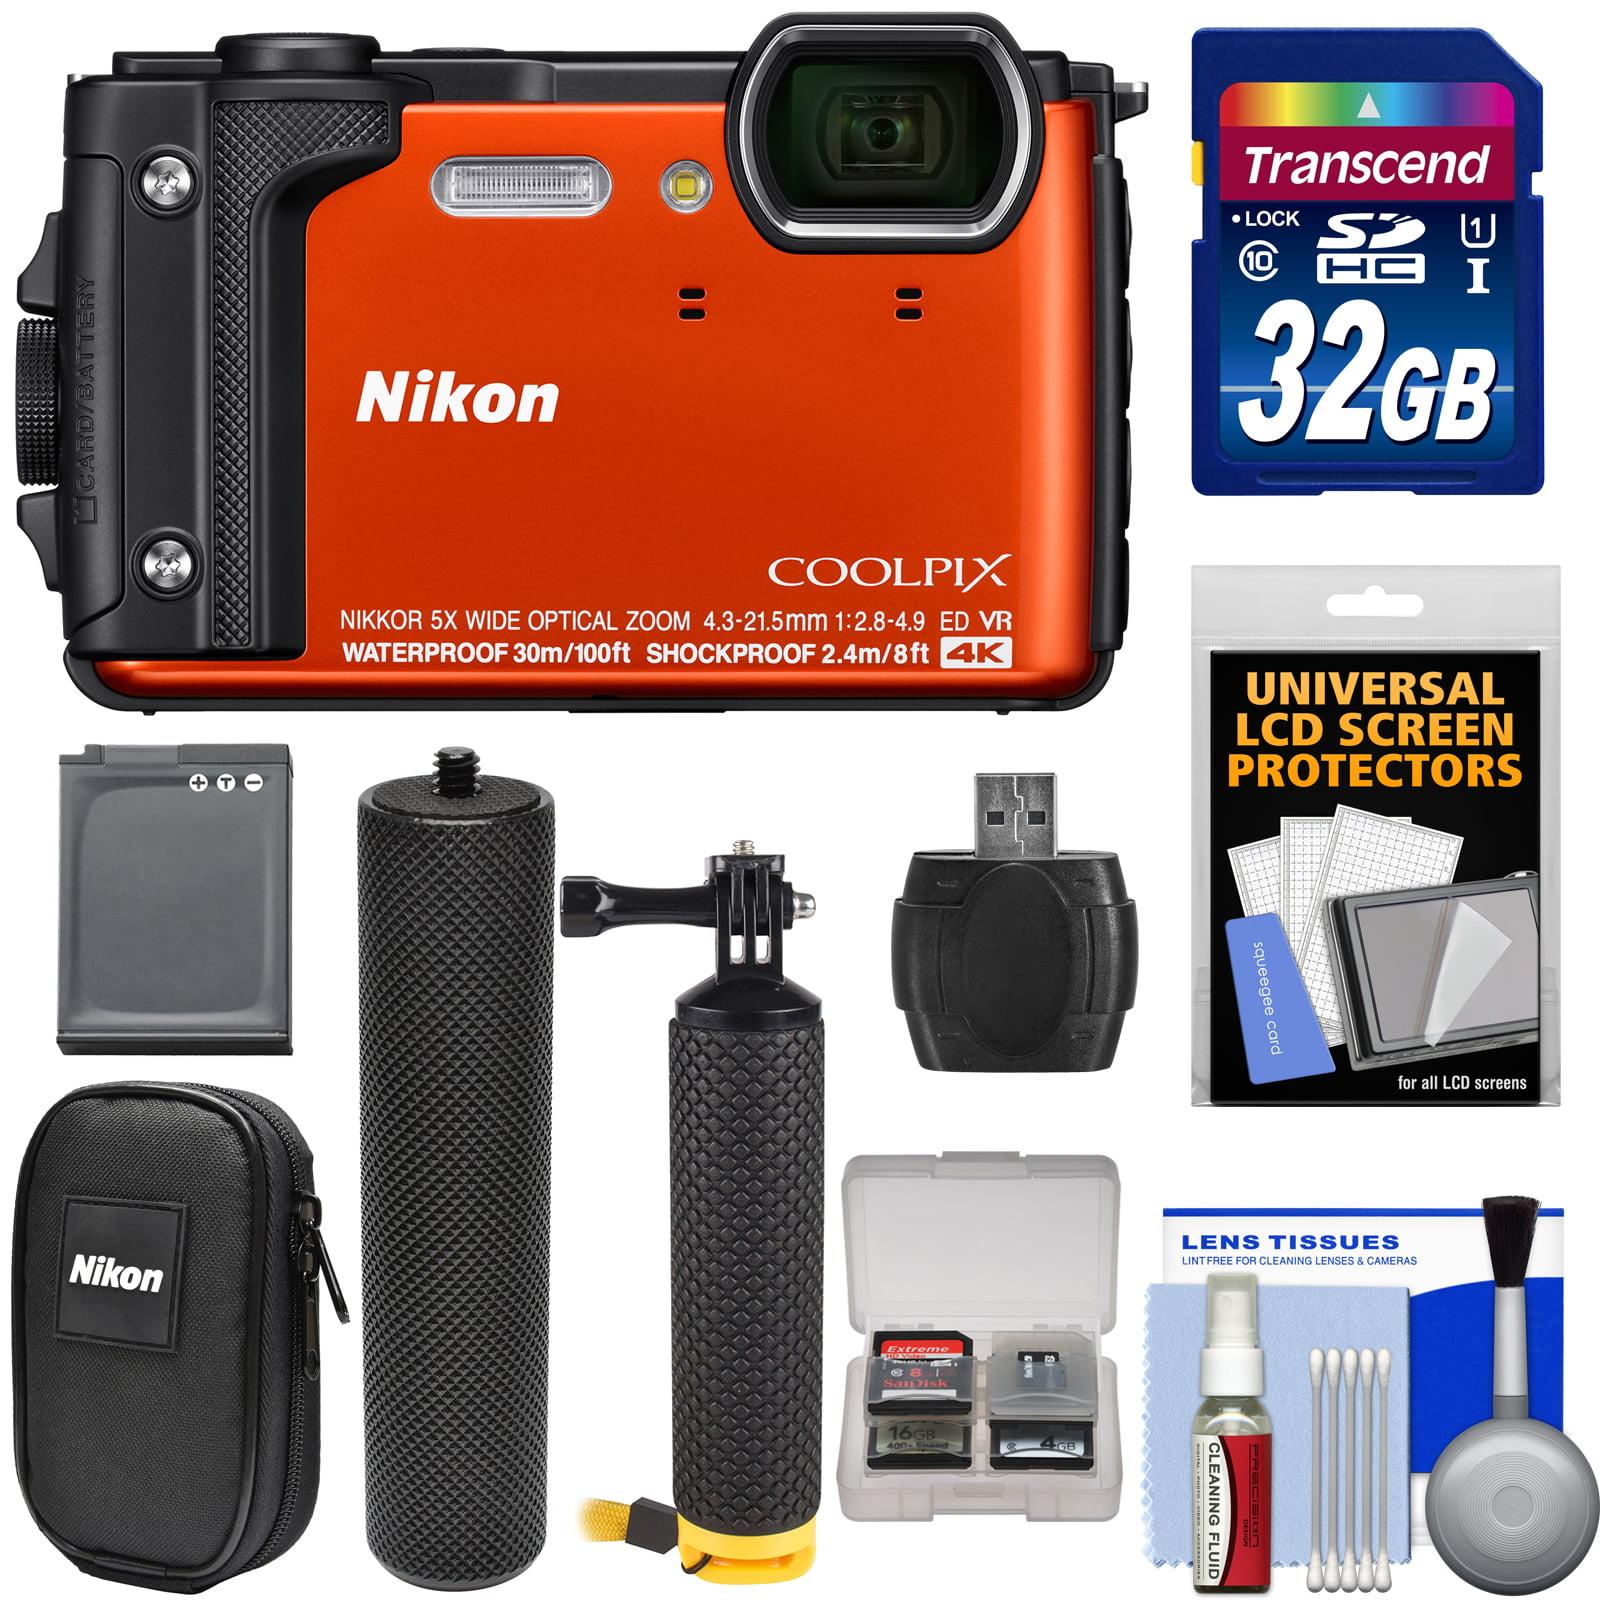 Nikon Coolpix W300 4K Wi-Fi Shock & Waterproof Digital Camera (Black) with 32GB Card + Battery + Case + Grip + Floating Handle + Kit